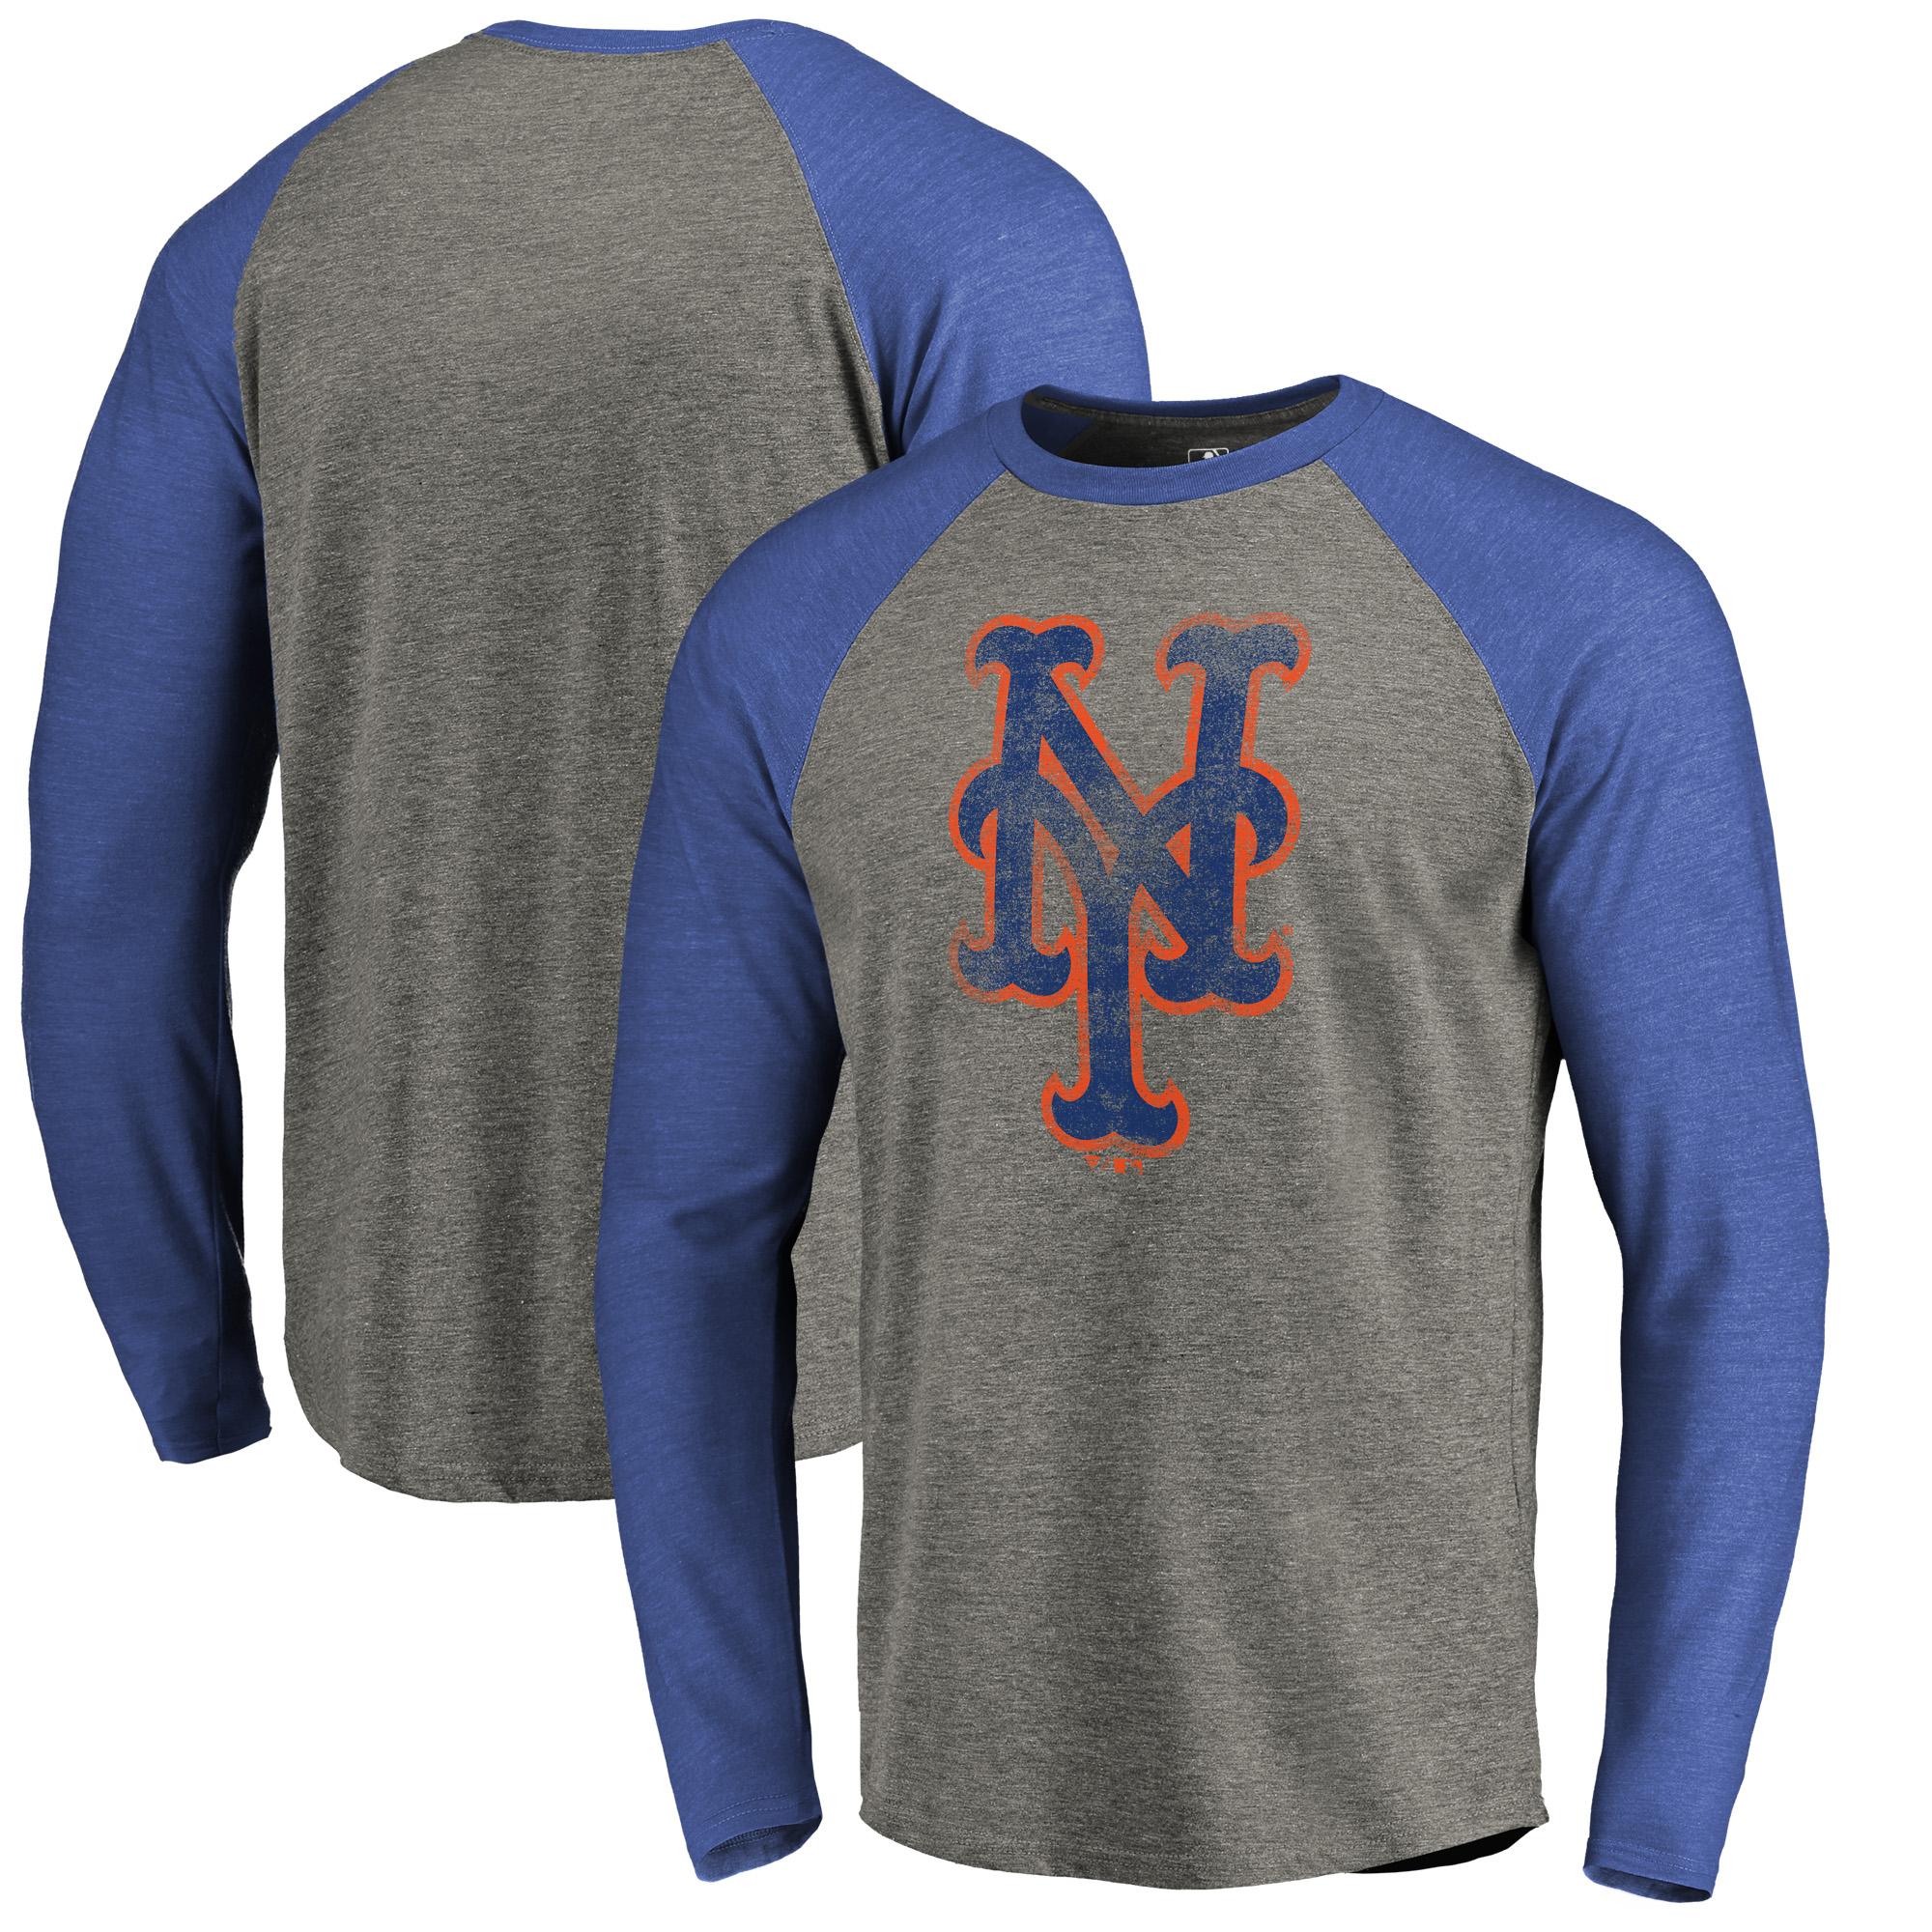 New York Mets Fanatics Branded Distressed Team Big & Tall Long Sleeve Tri-Blend Raglan T-Shirt - Gray/Royal